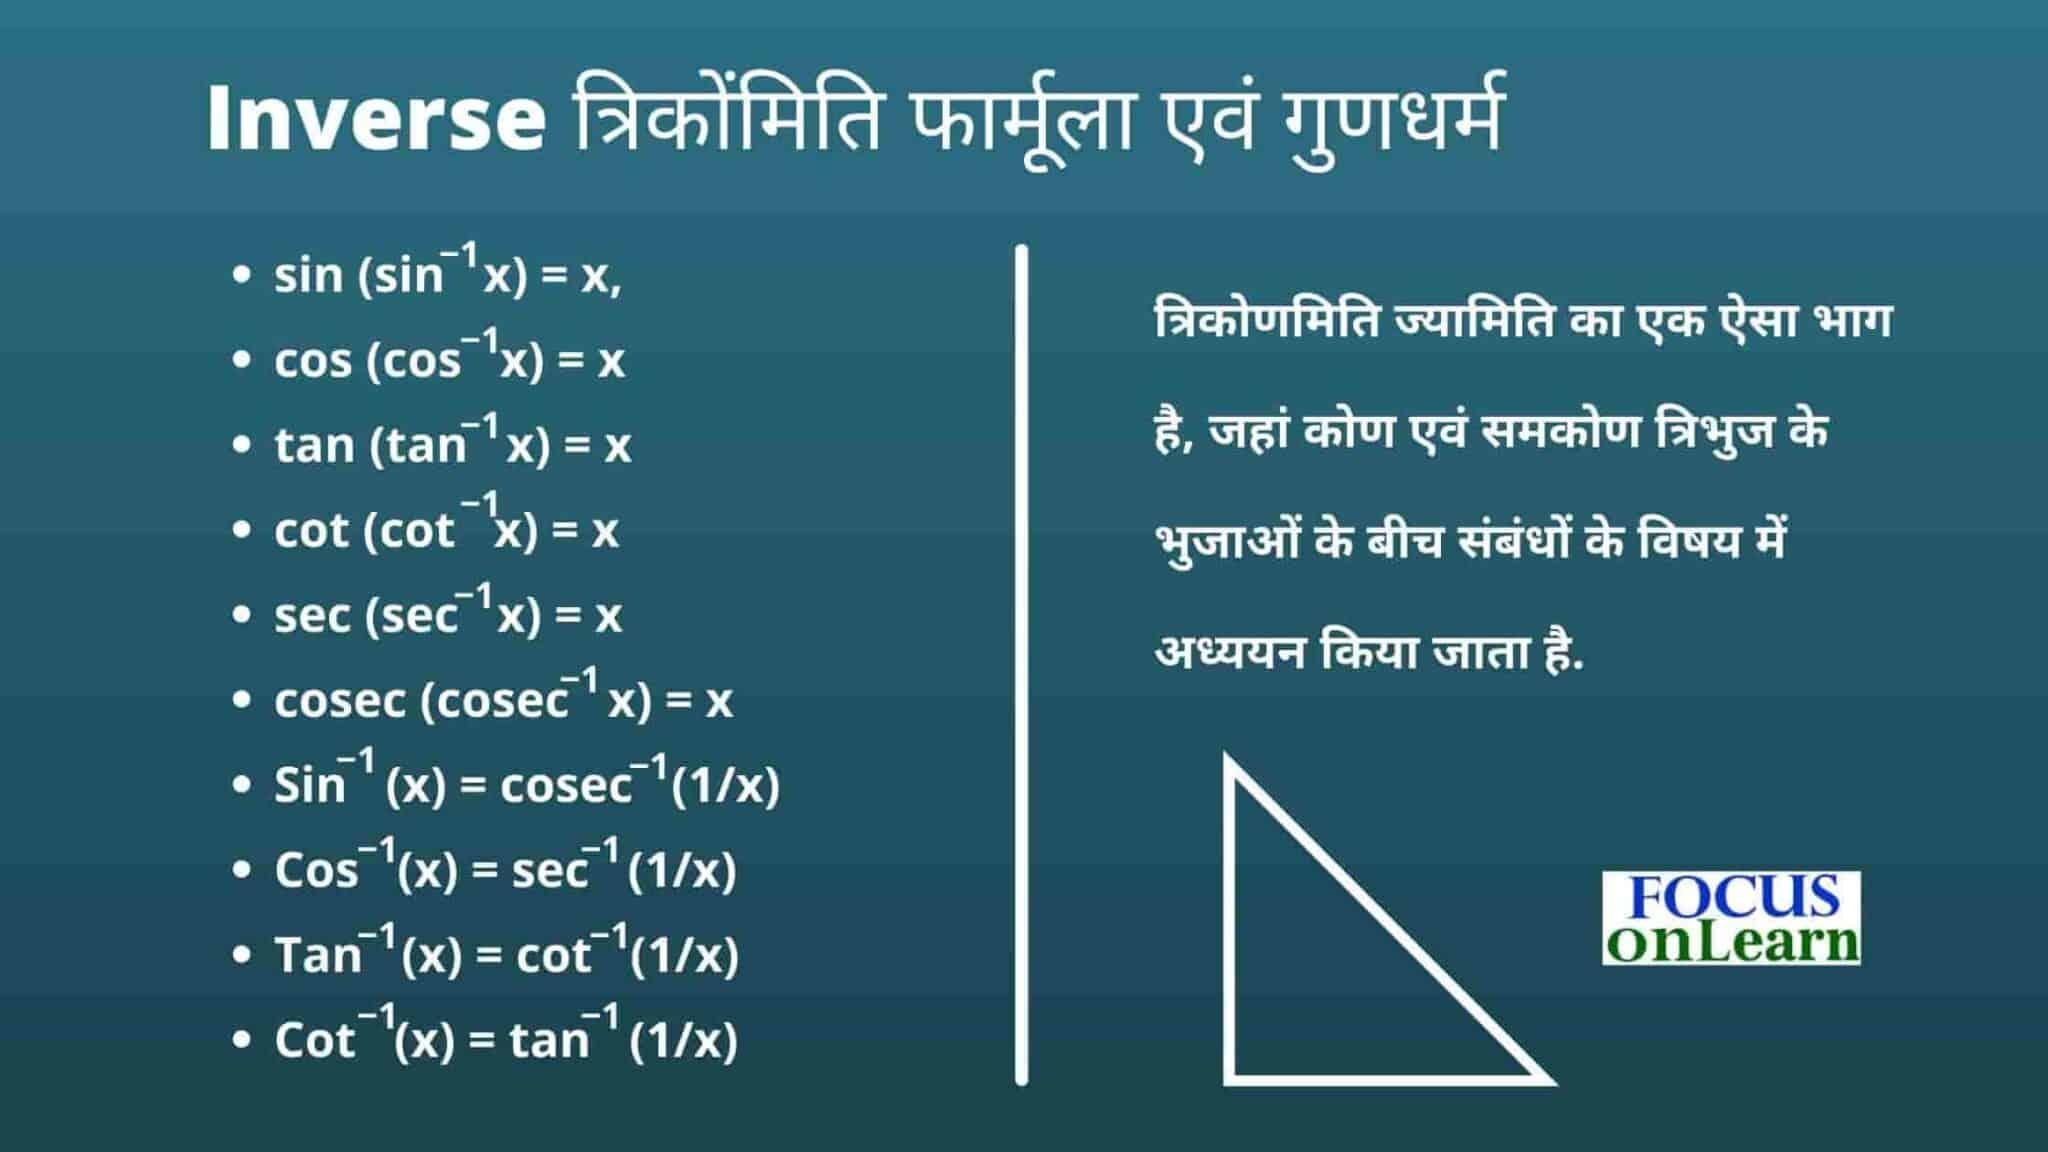 Inverse Trigonometry Formula in Hindi